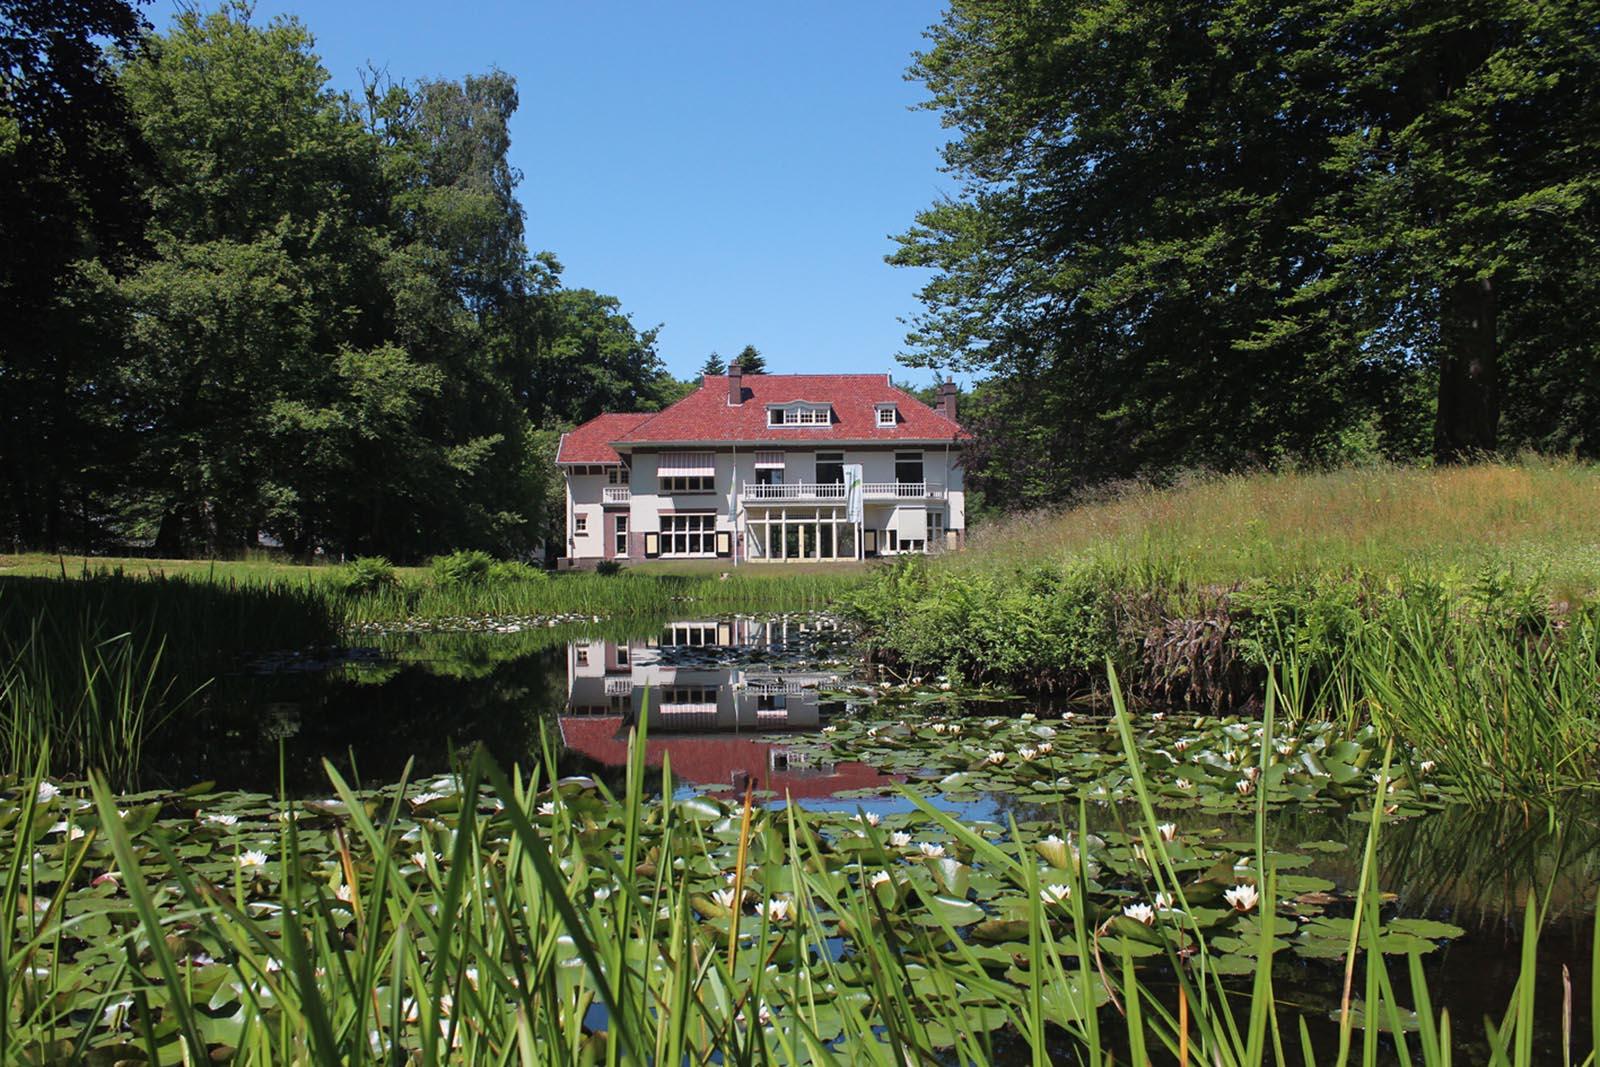 Park Huize Olterterp